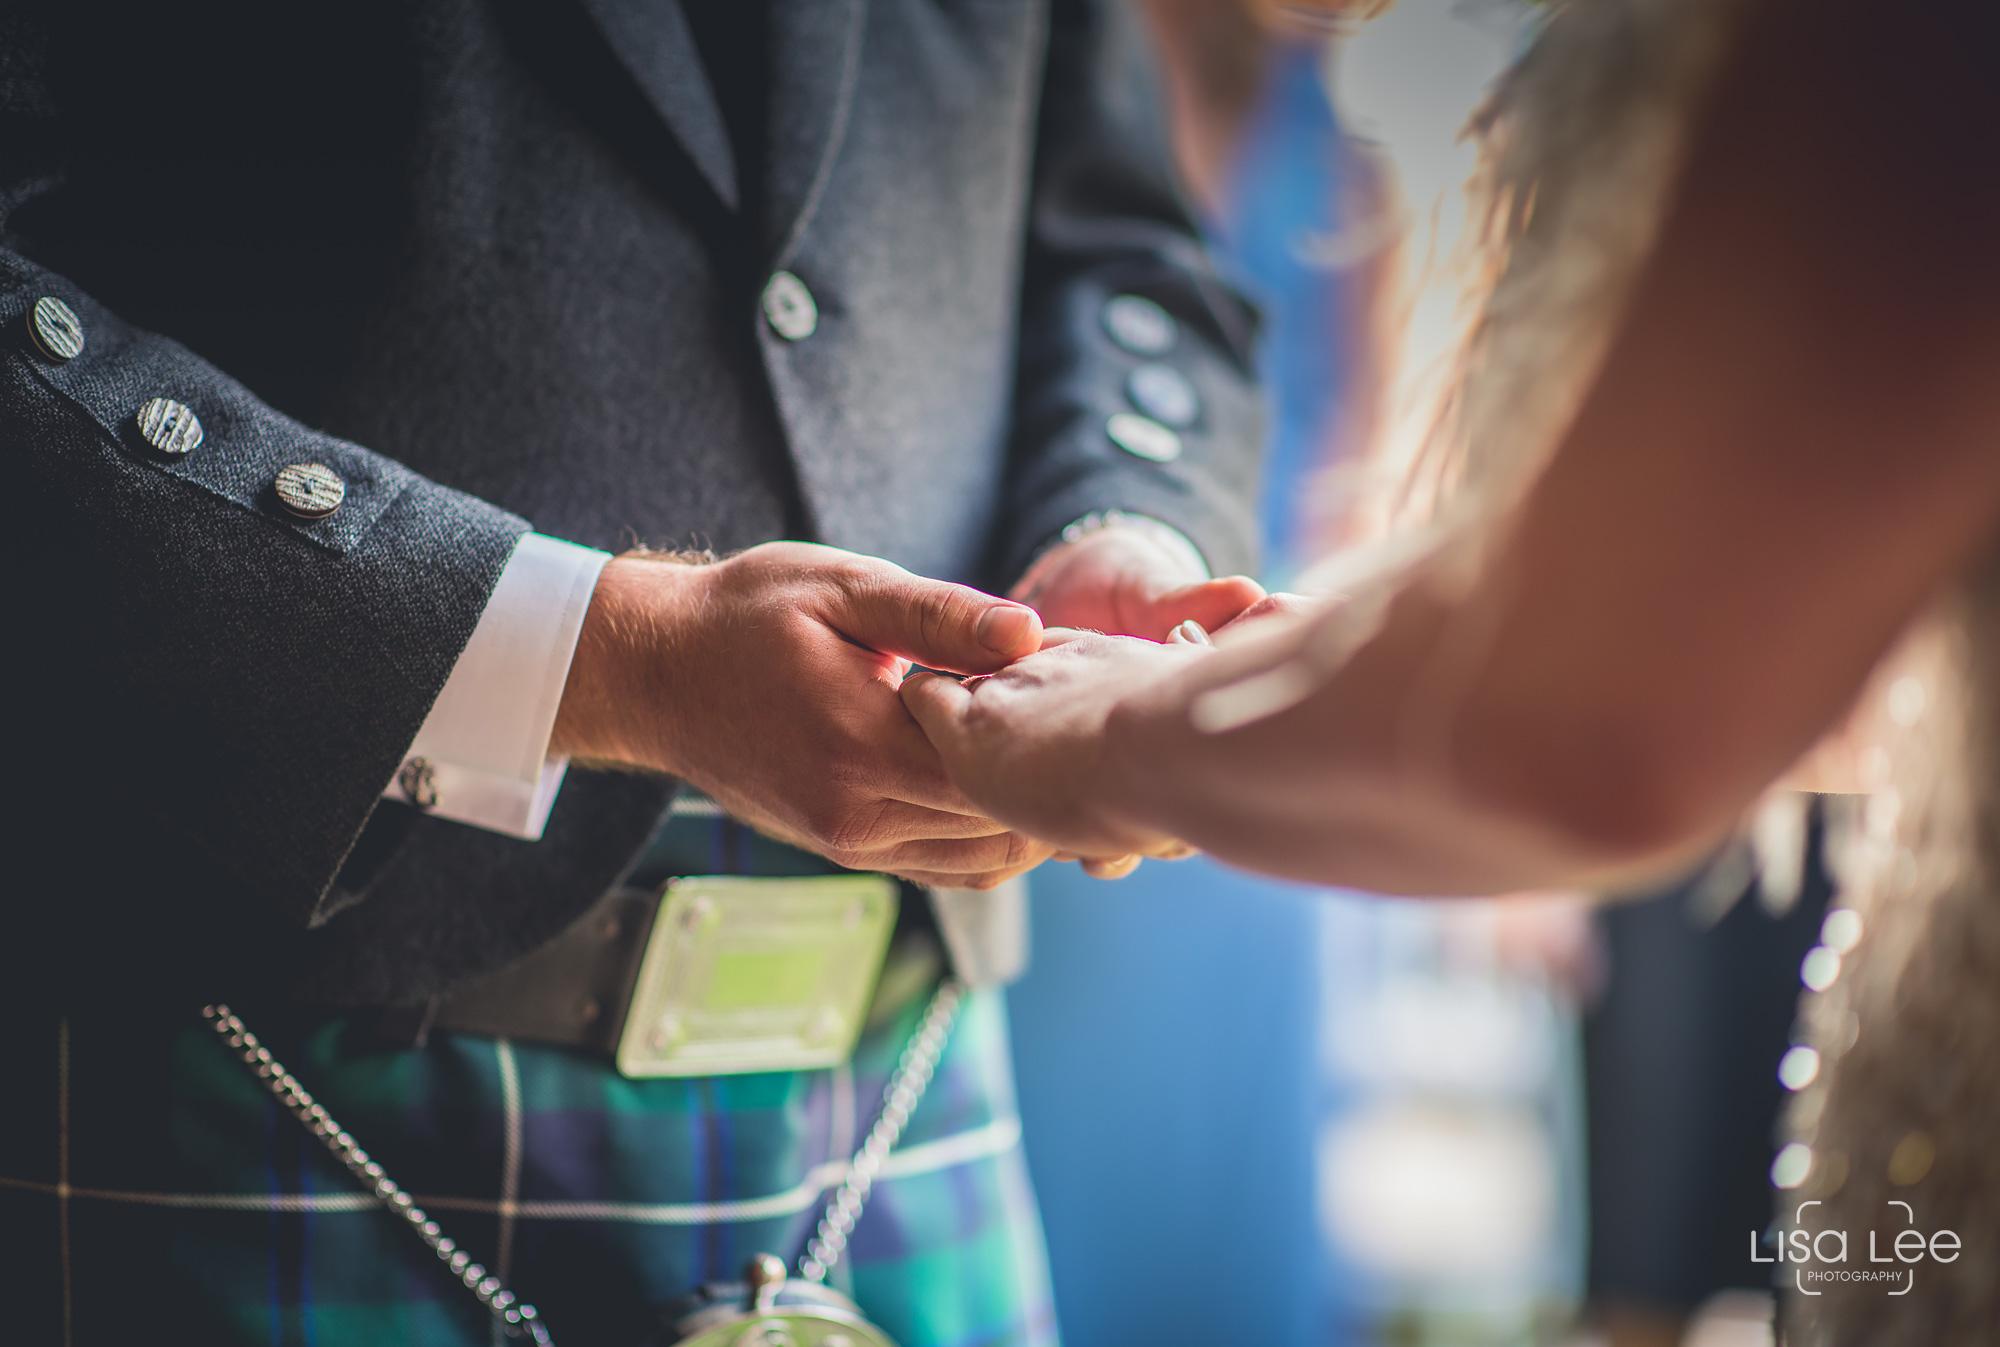 lisa-lee-wedding-photography-ceremony-talbot-heath-22.jpg